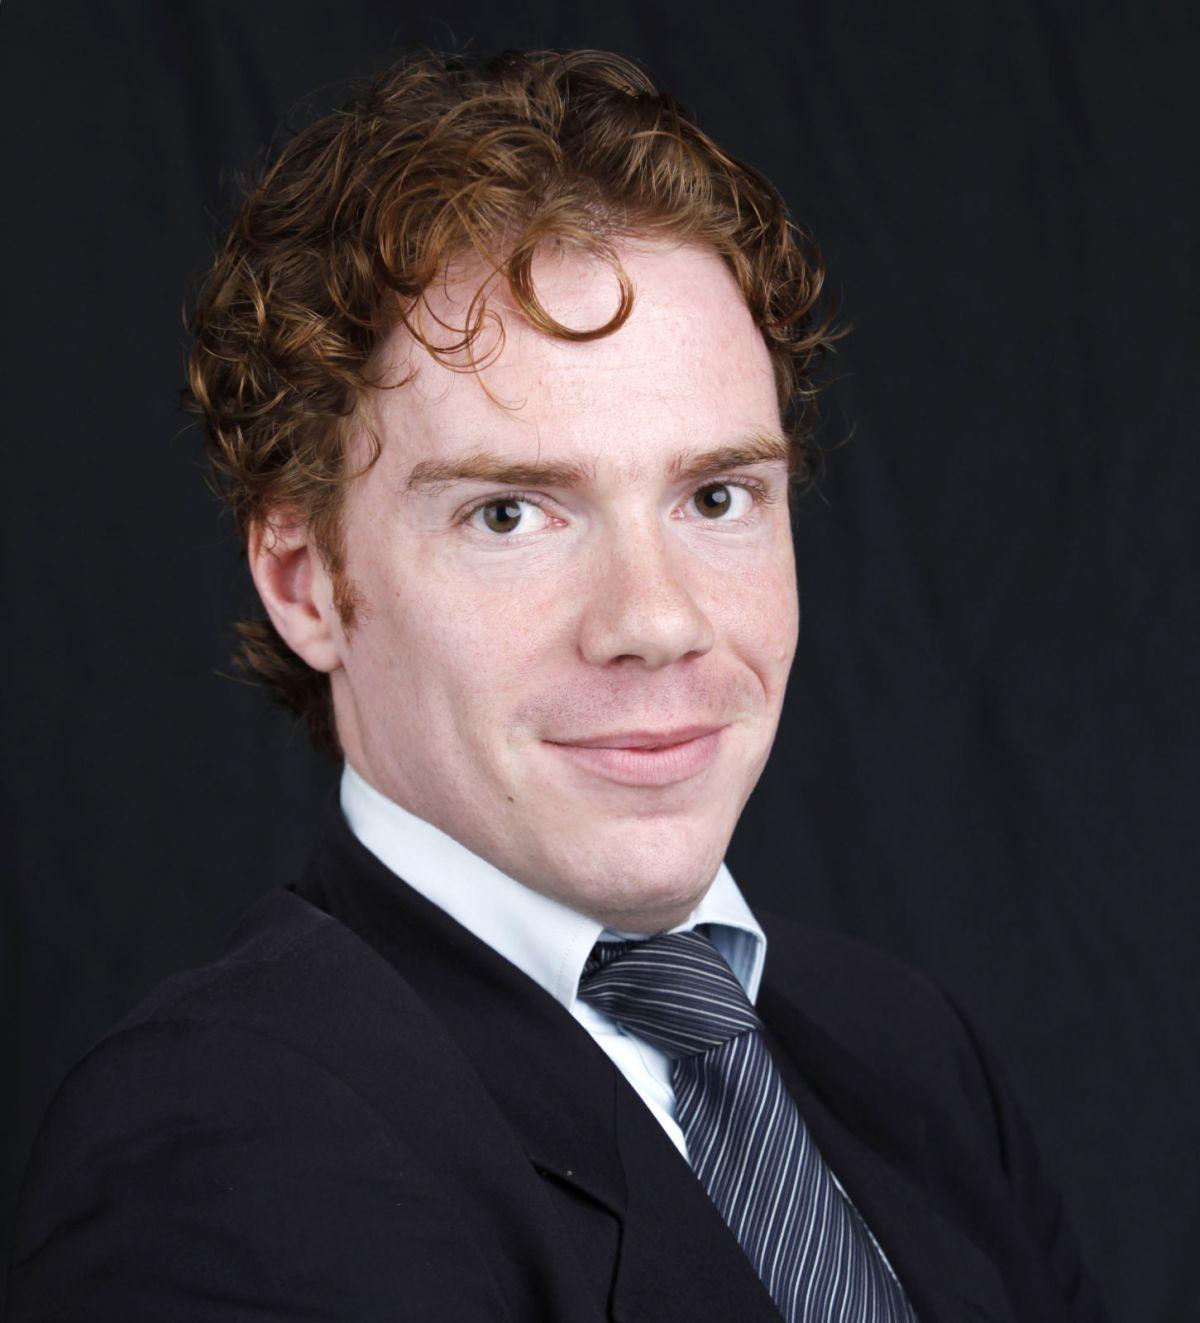 portretfoto Bas van Bommel